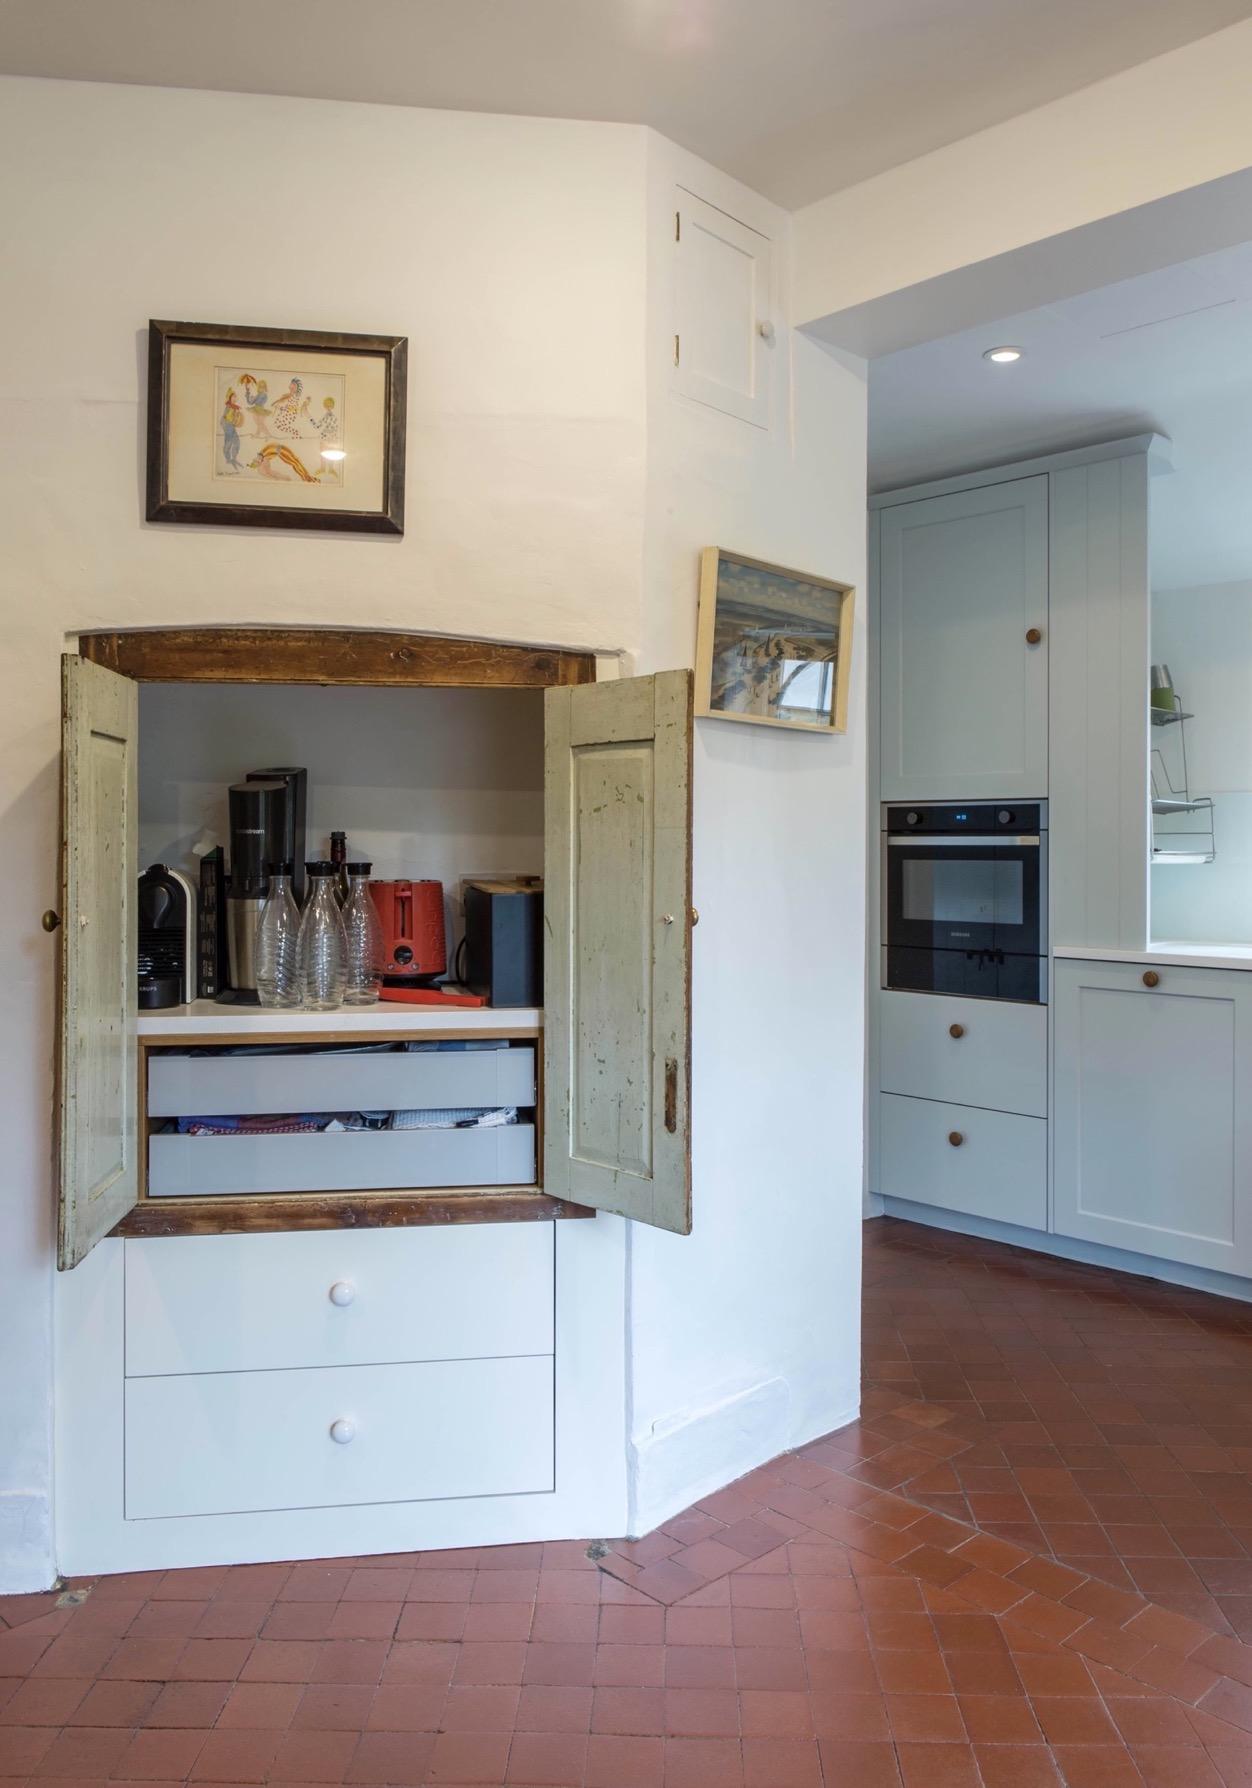 clever inset storage upcycled doors haddenham buckinghamshire bespoke kitchen 2